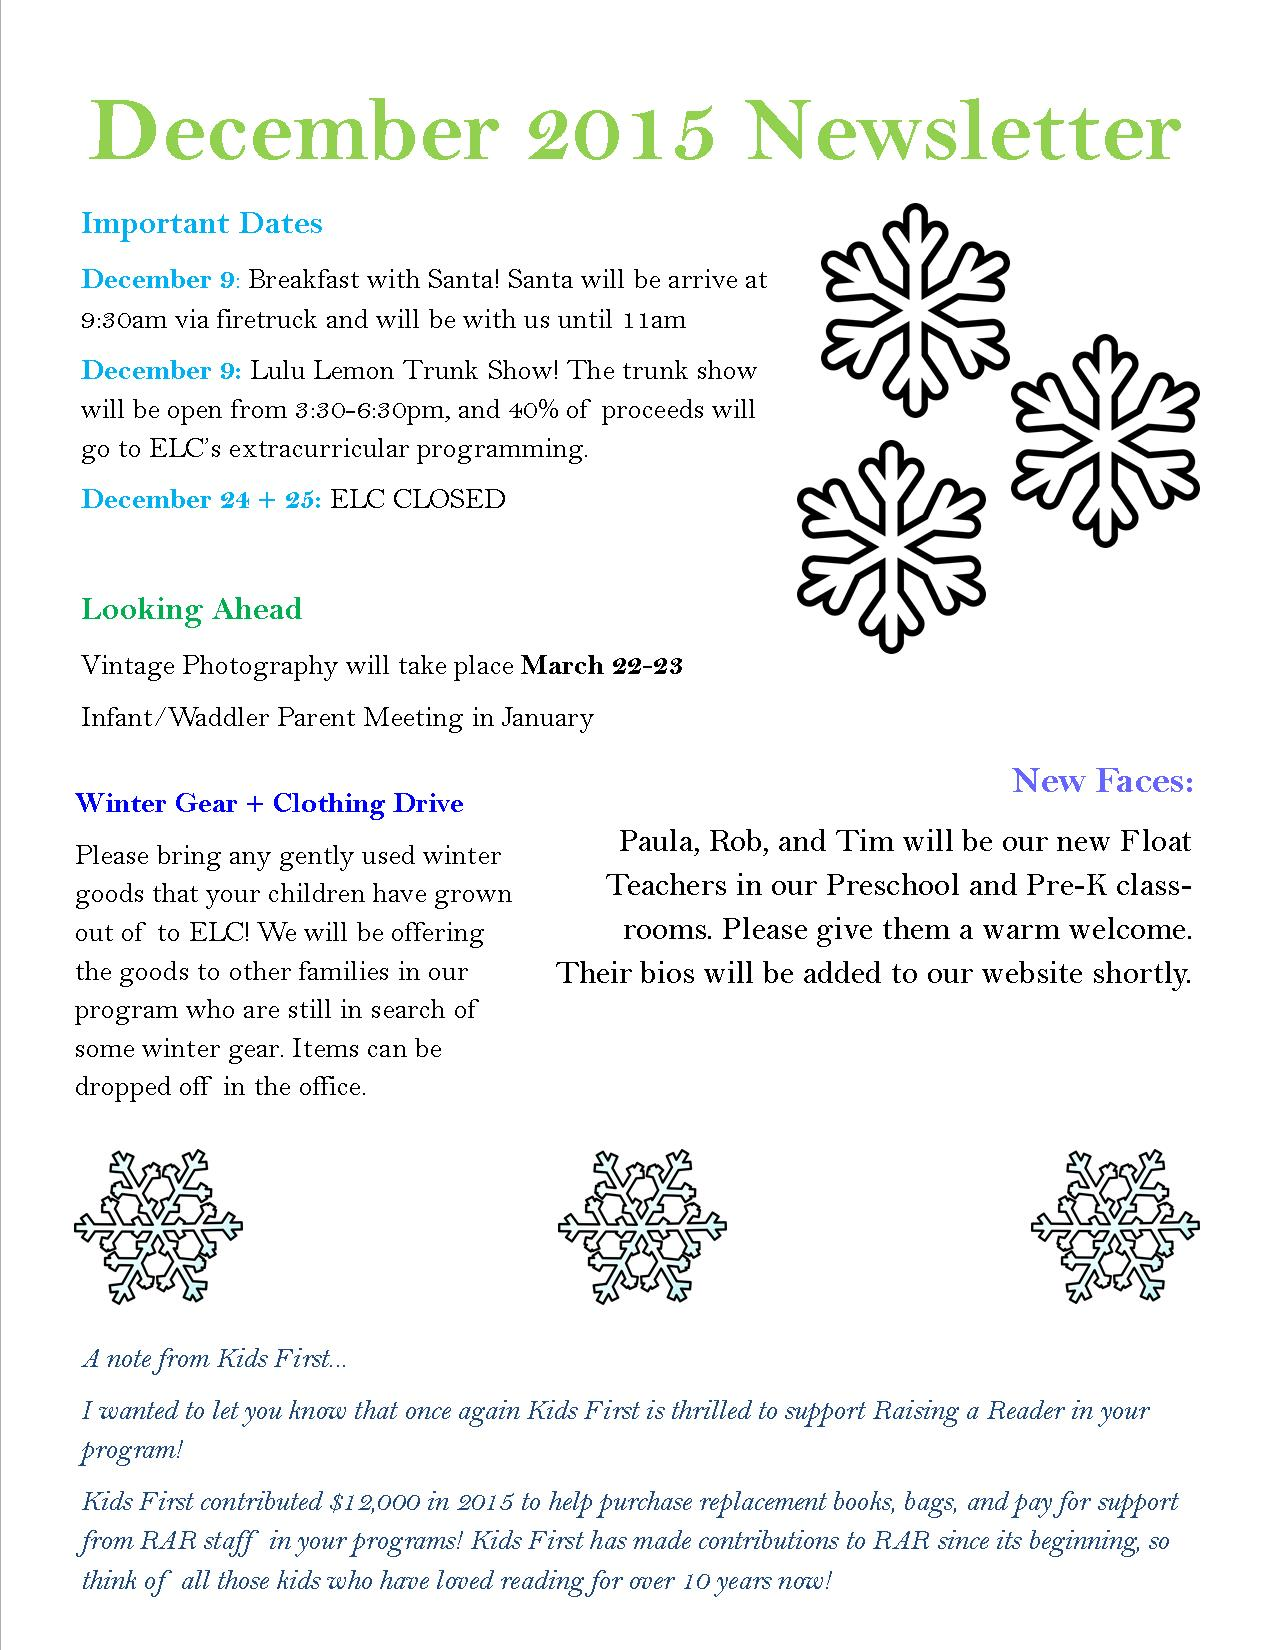 December 2015 Newsletter Preschool PreK.jpg